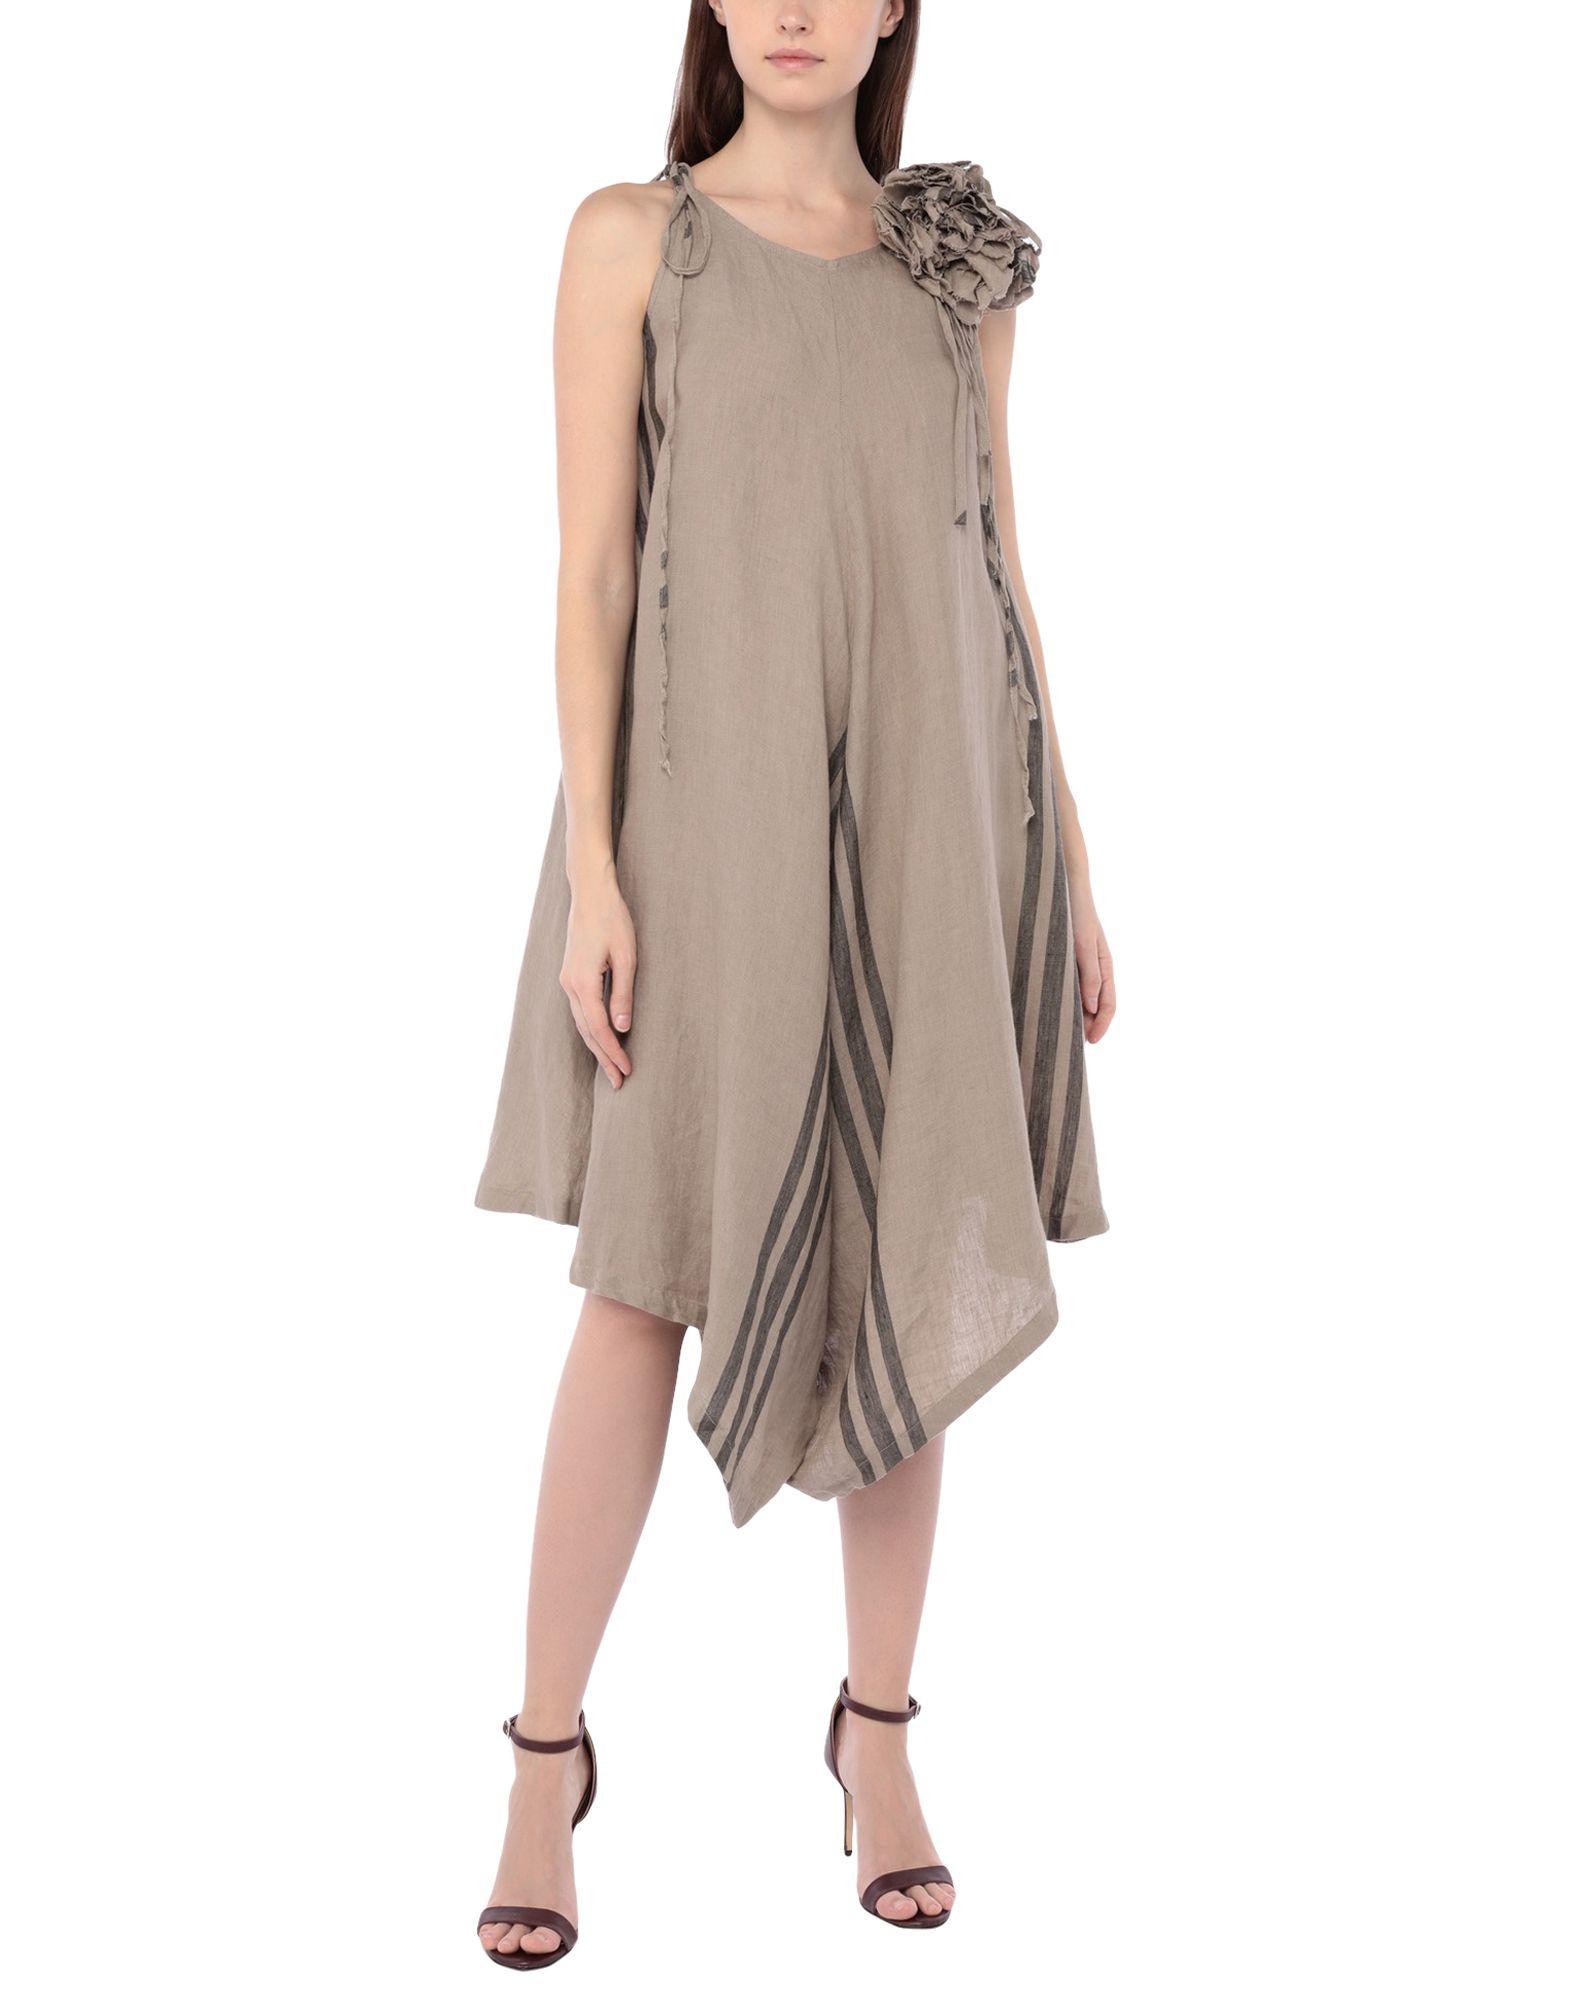 ALEKSANDR MANAMÏS Платье до колена